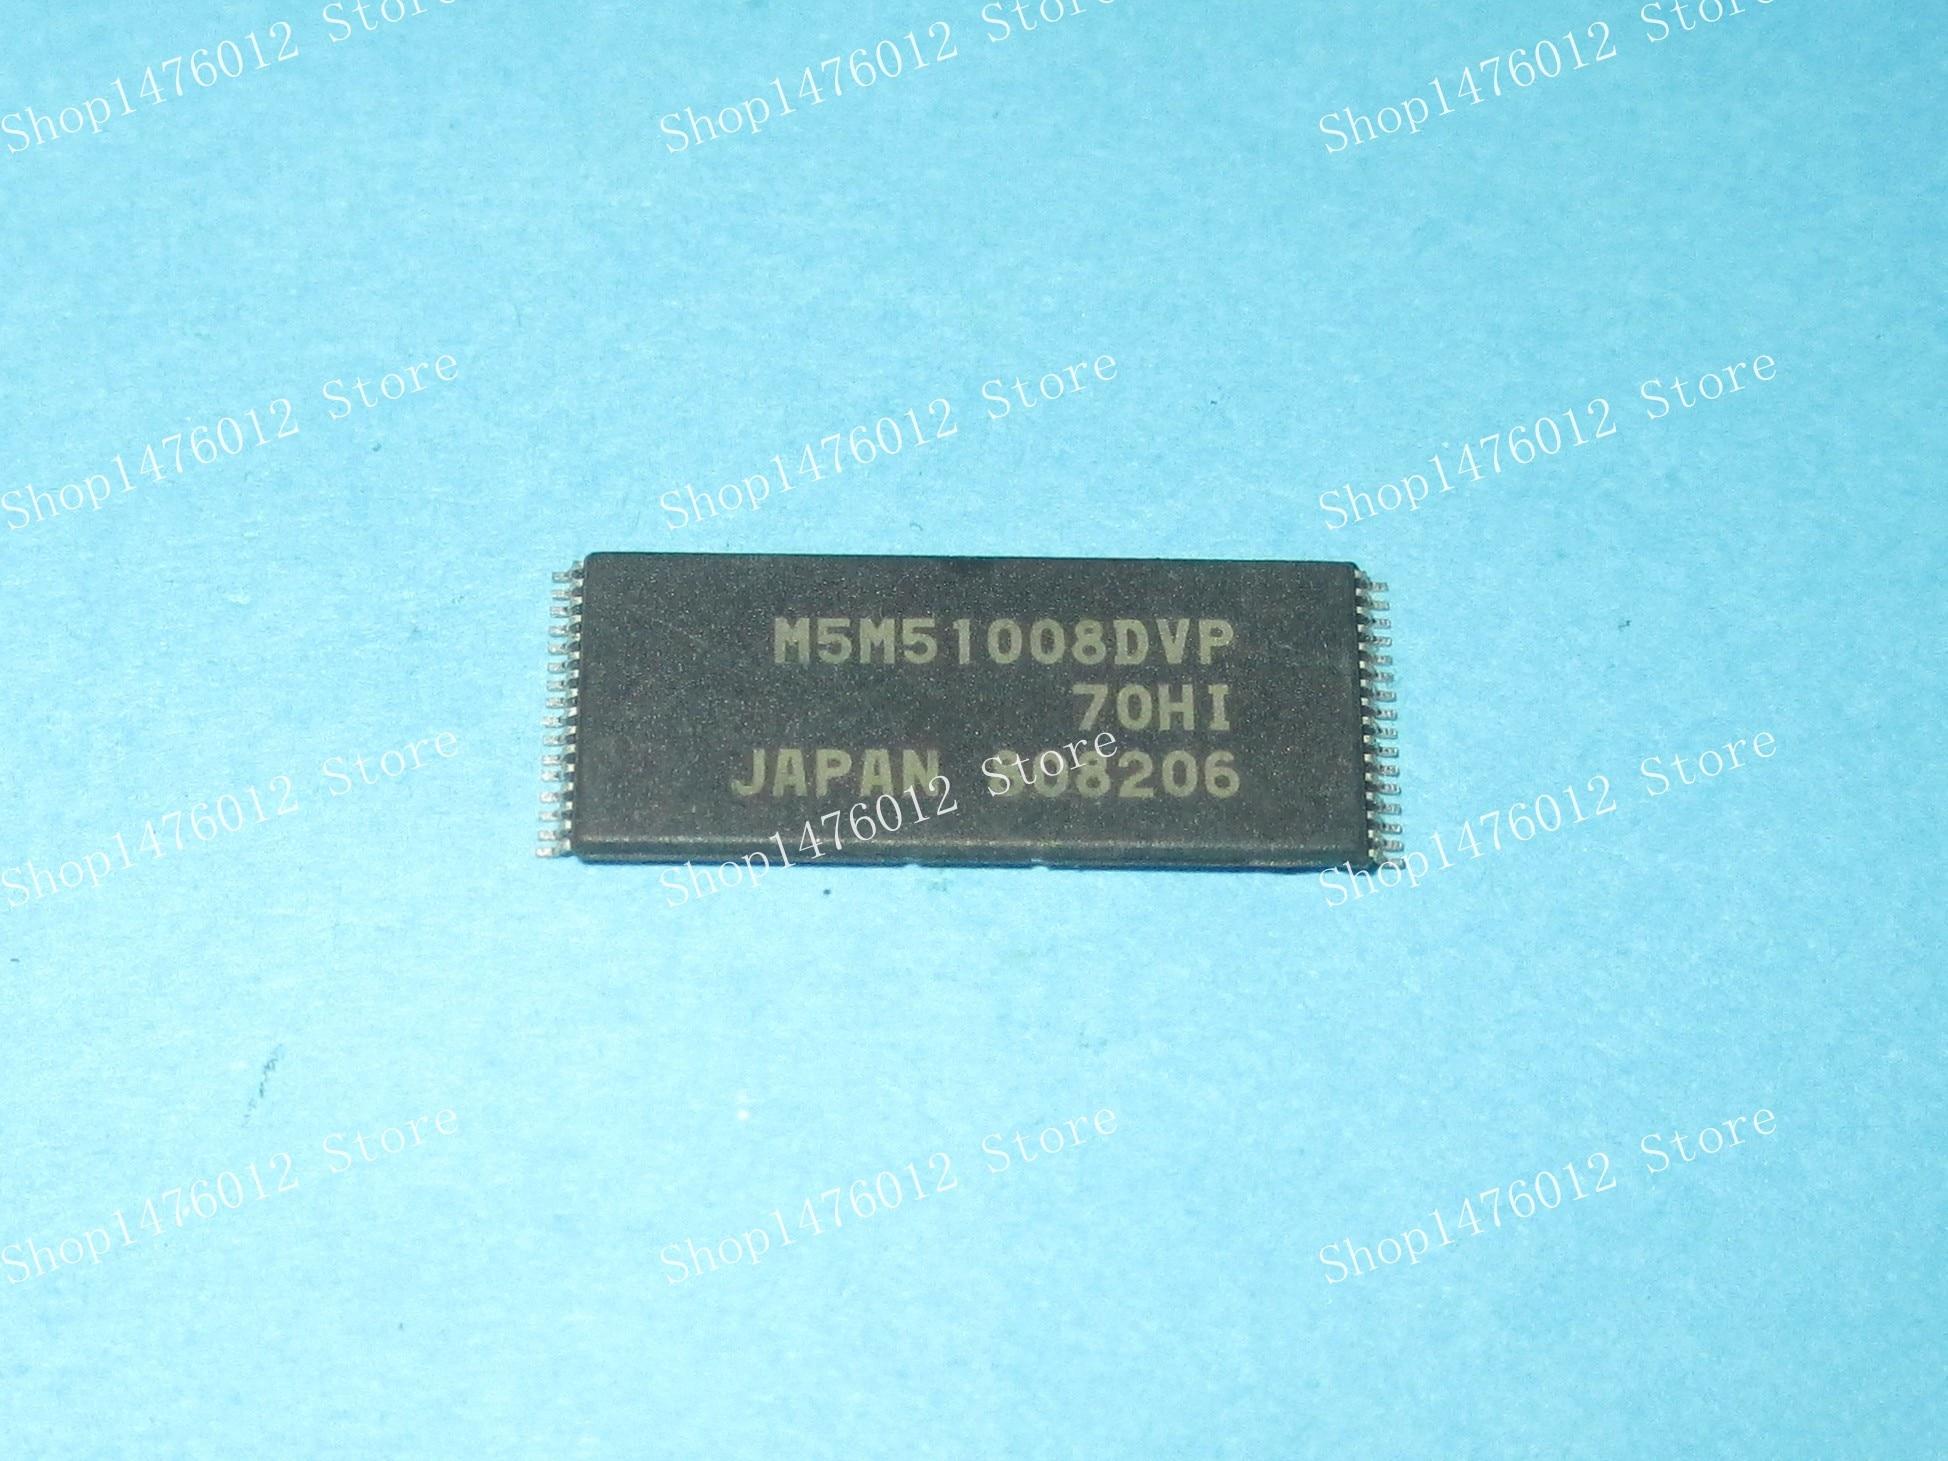 10PCS M5M51008DVP-70HI M5M51008DVP-55HI M5M51008DVP M5M51008 TSOP32 circuito Integrado IC